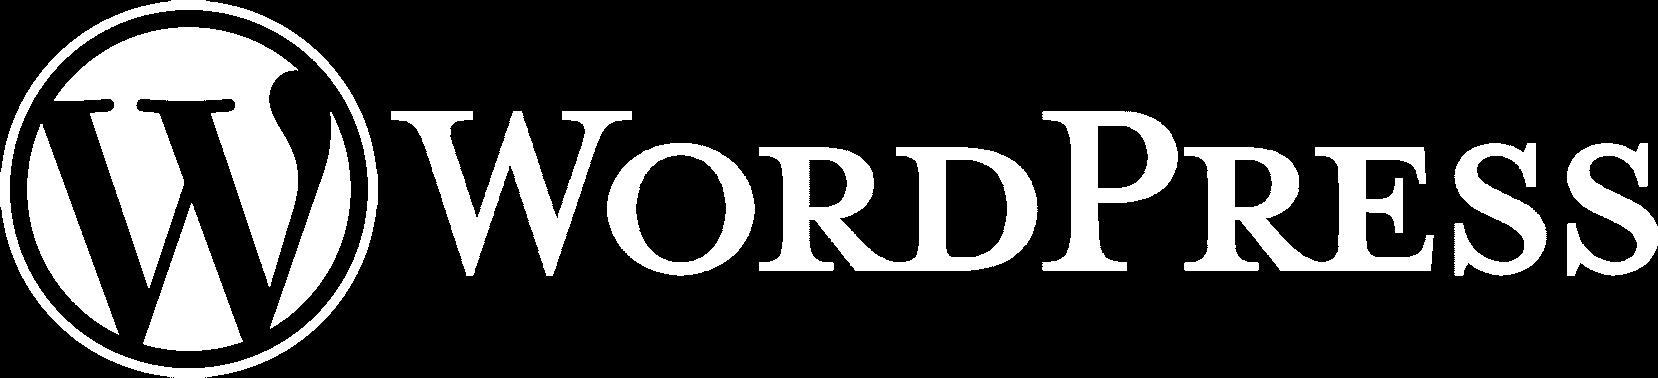 Wordpress Web Designers